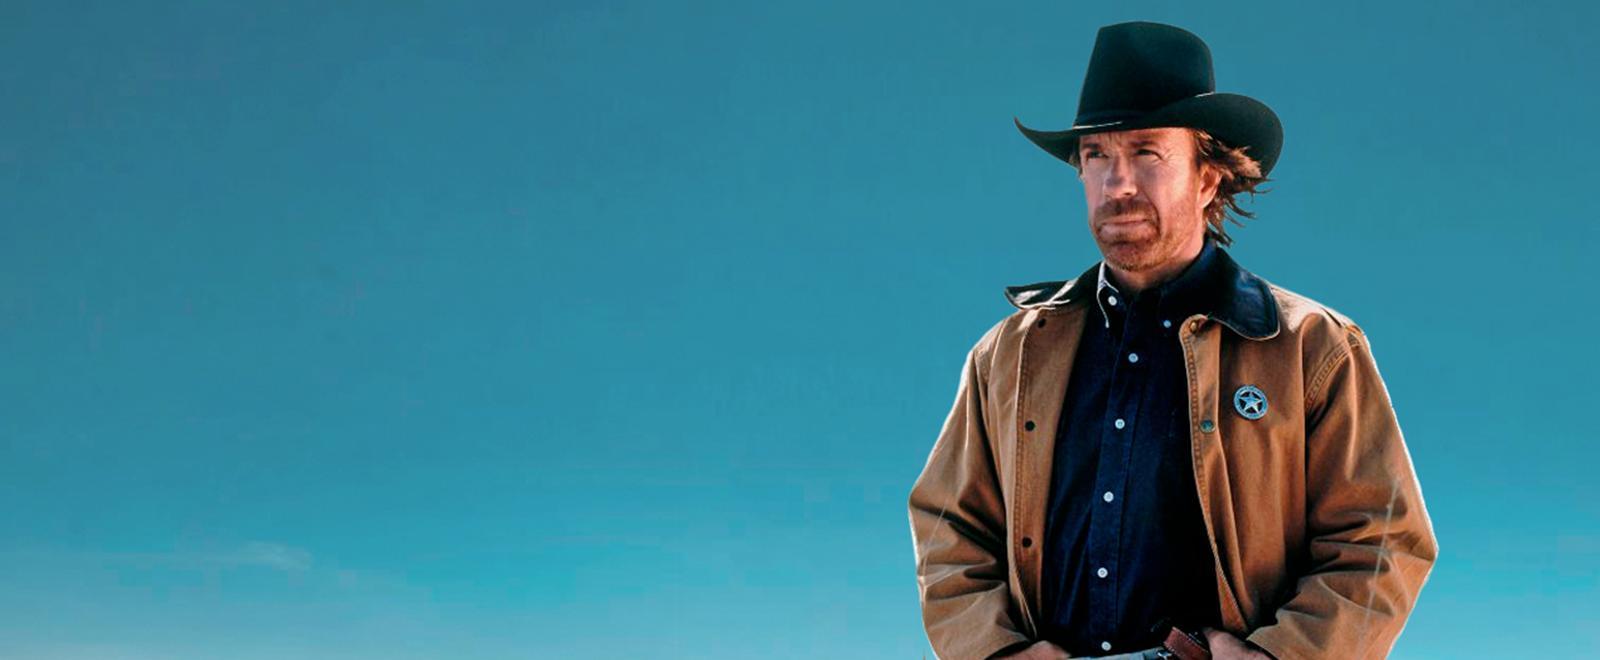 Walker Texas Ranger